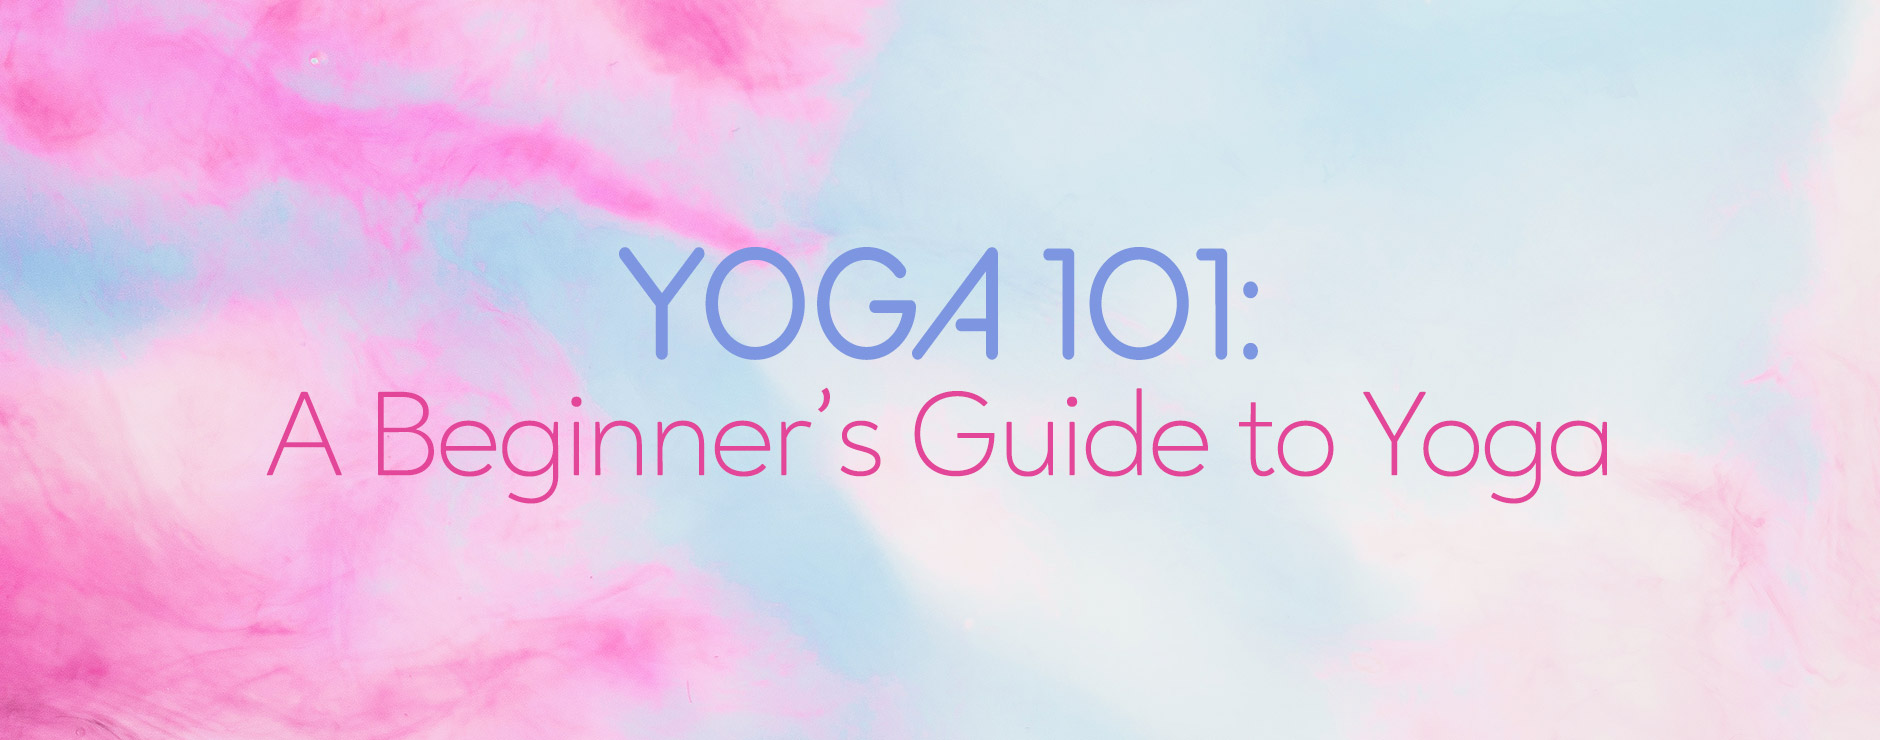 yoga 101 beginner guide yoga online on demand FORM yoga Decatur